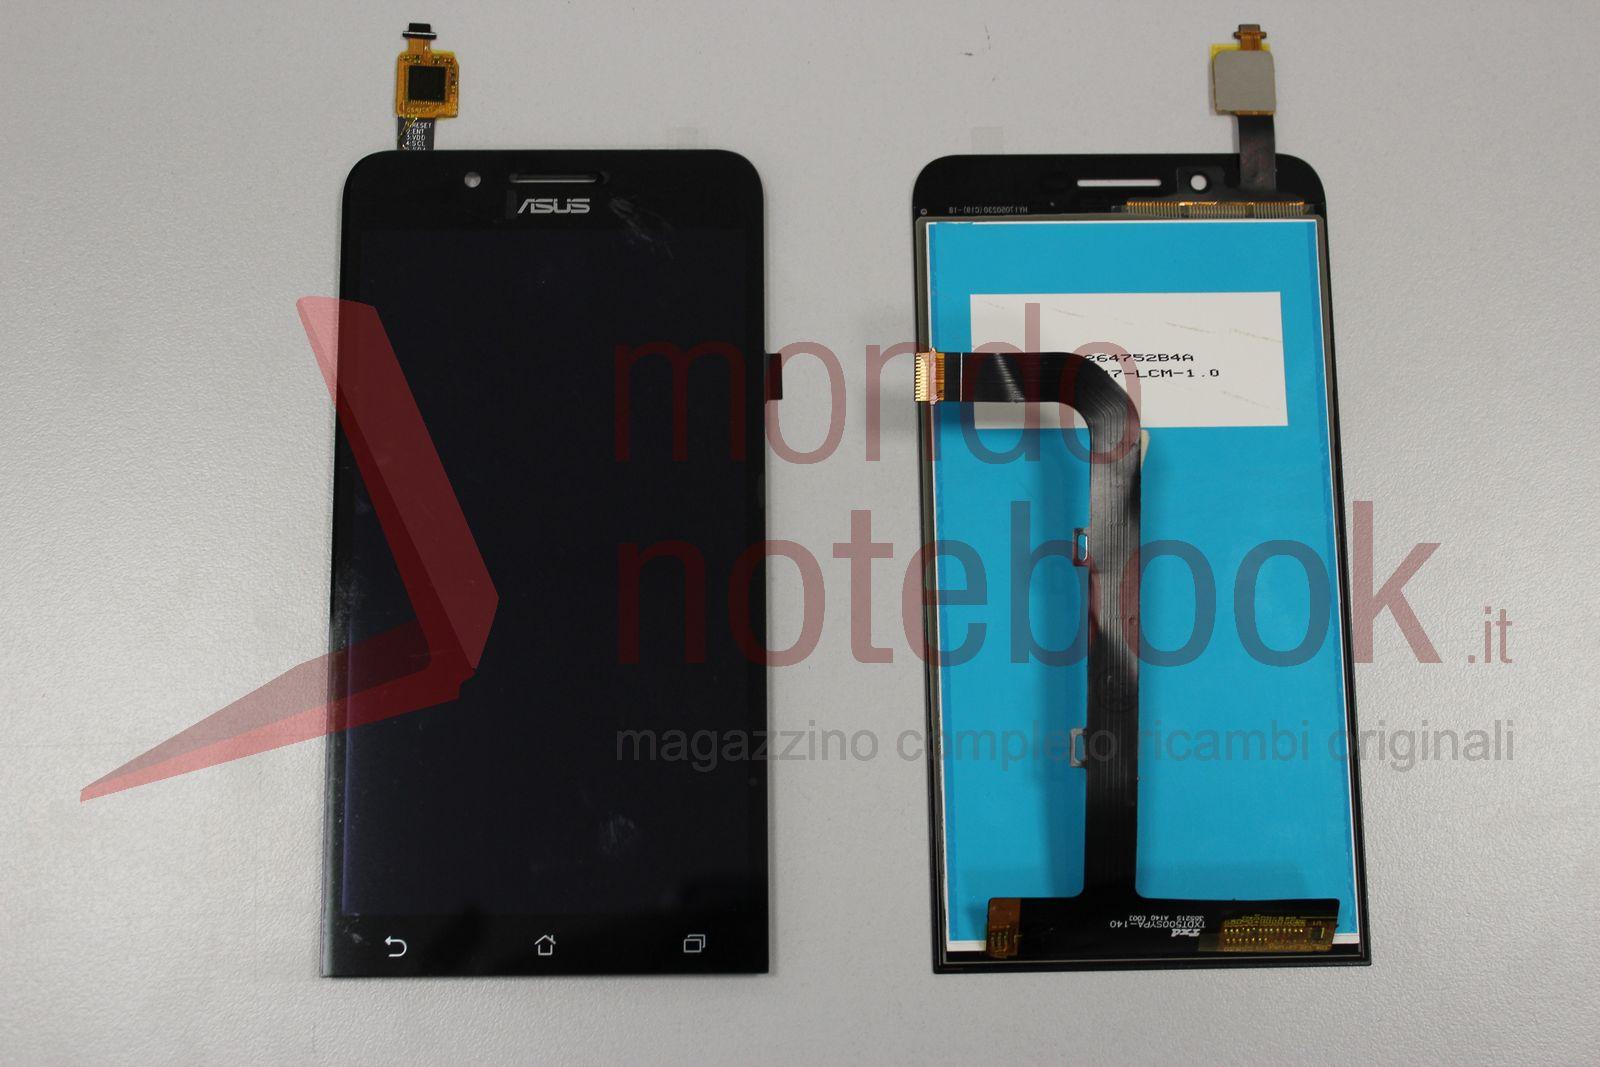 https://www.mondonotebook.it/7533/iphone-5s-complete-joystick-internal-home-button-flex-with-fingerprint-sensor-white.jpg